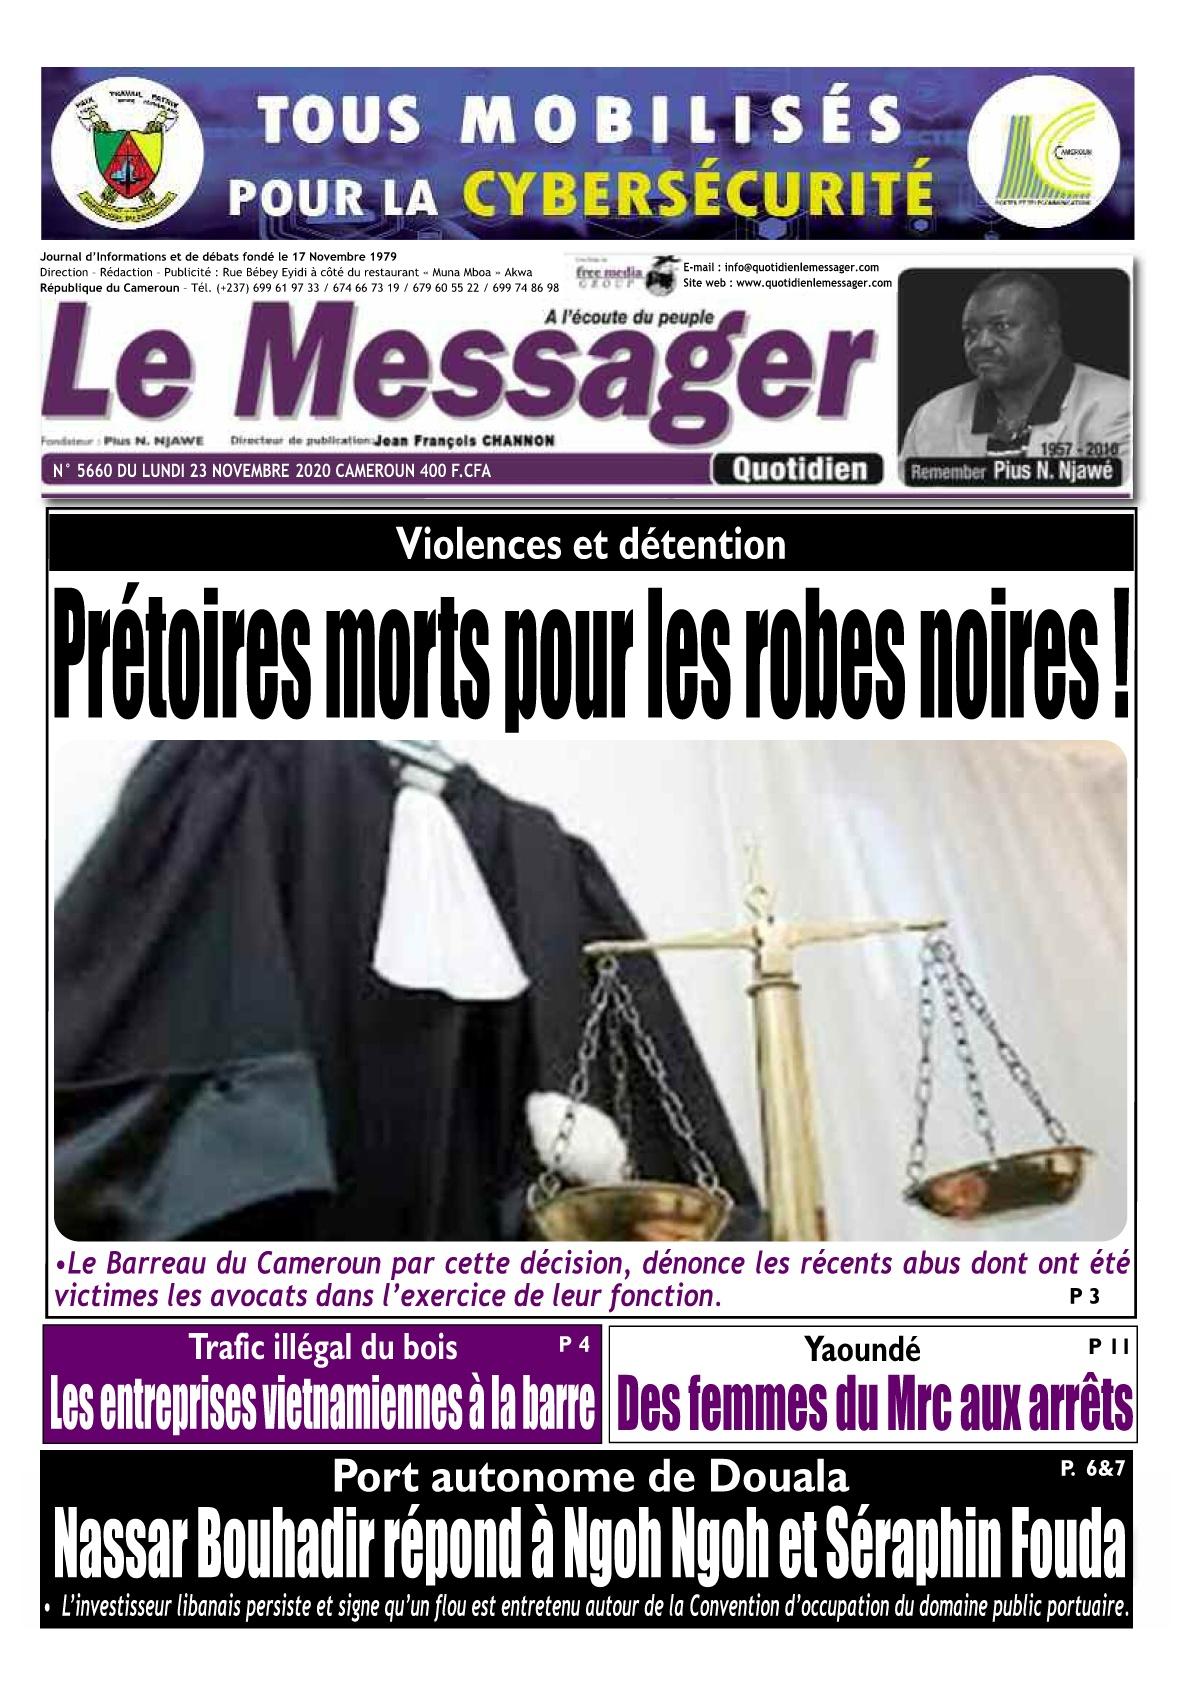 Le Messager - 23/11/2020